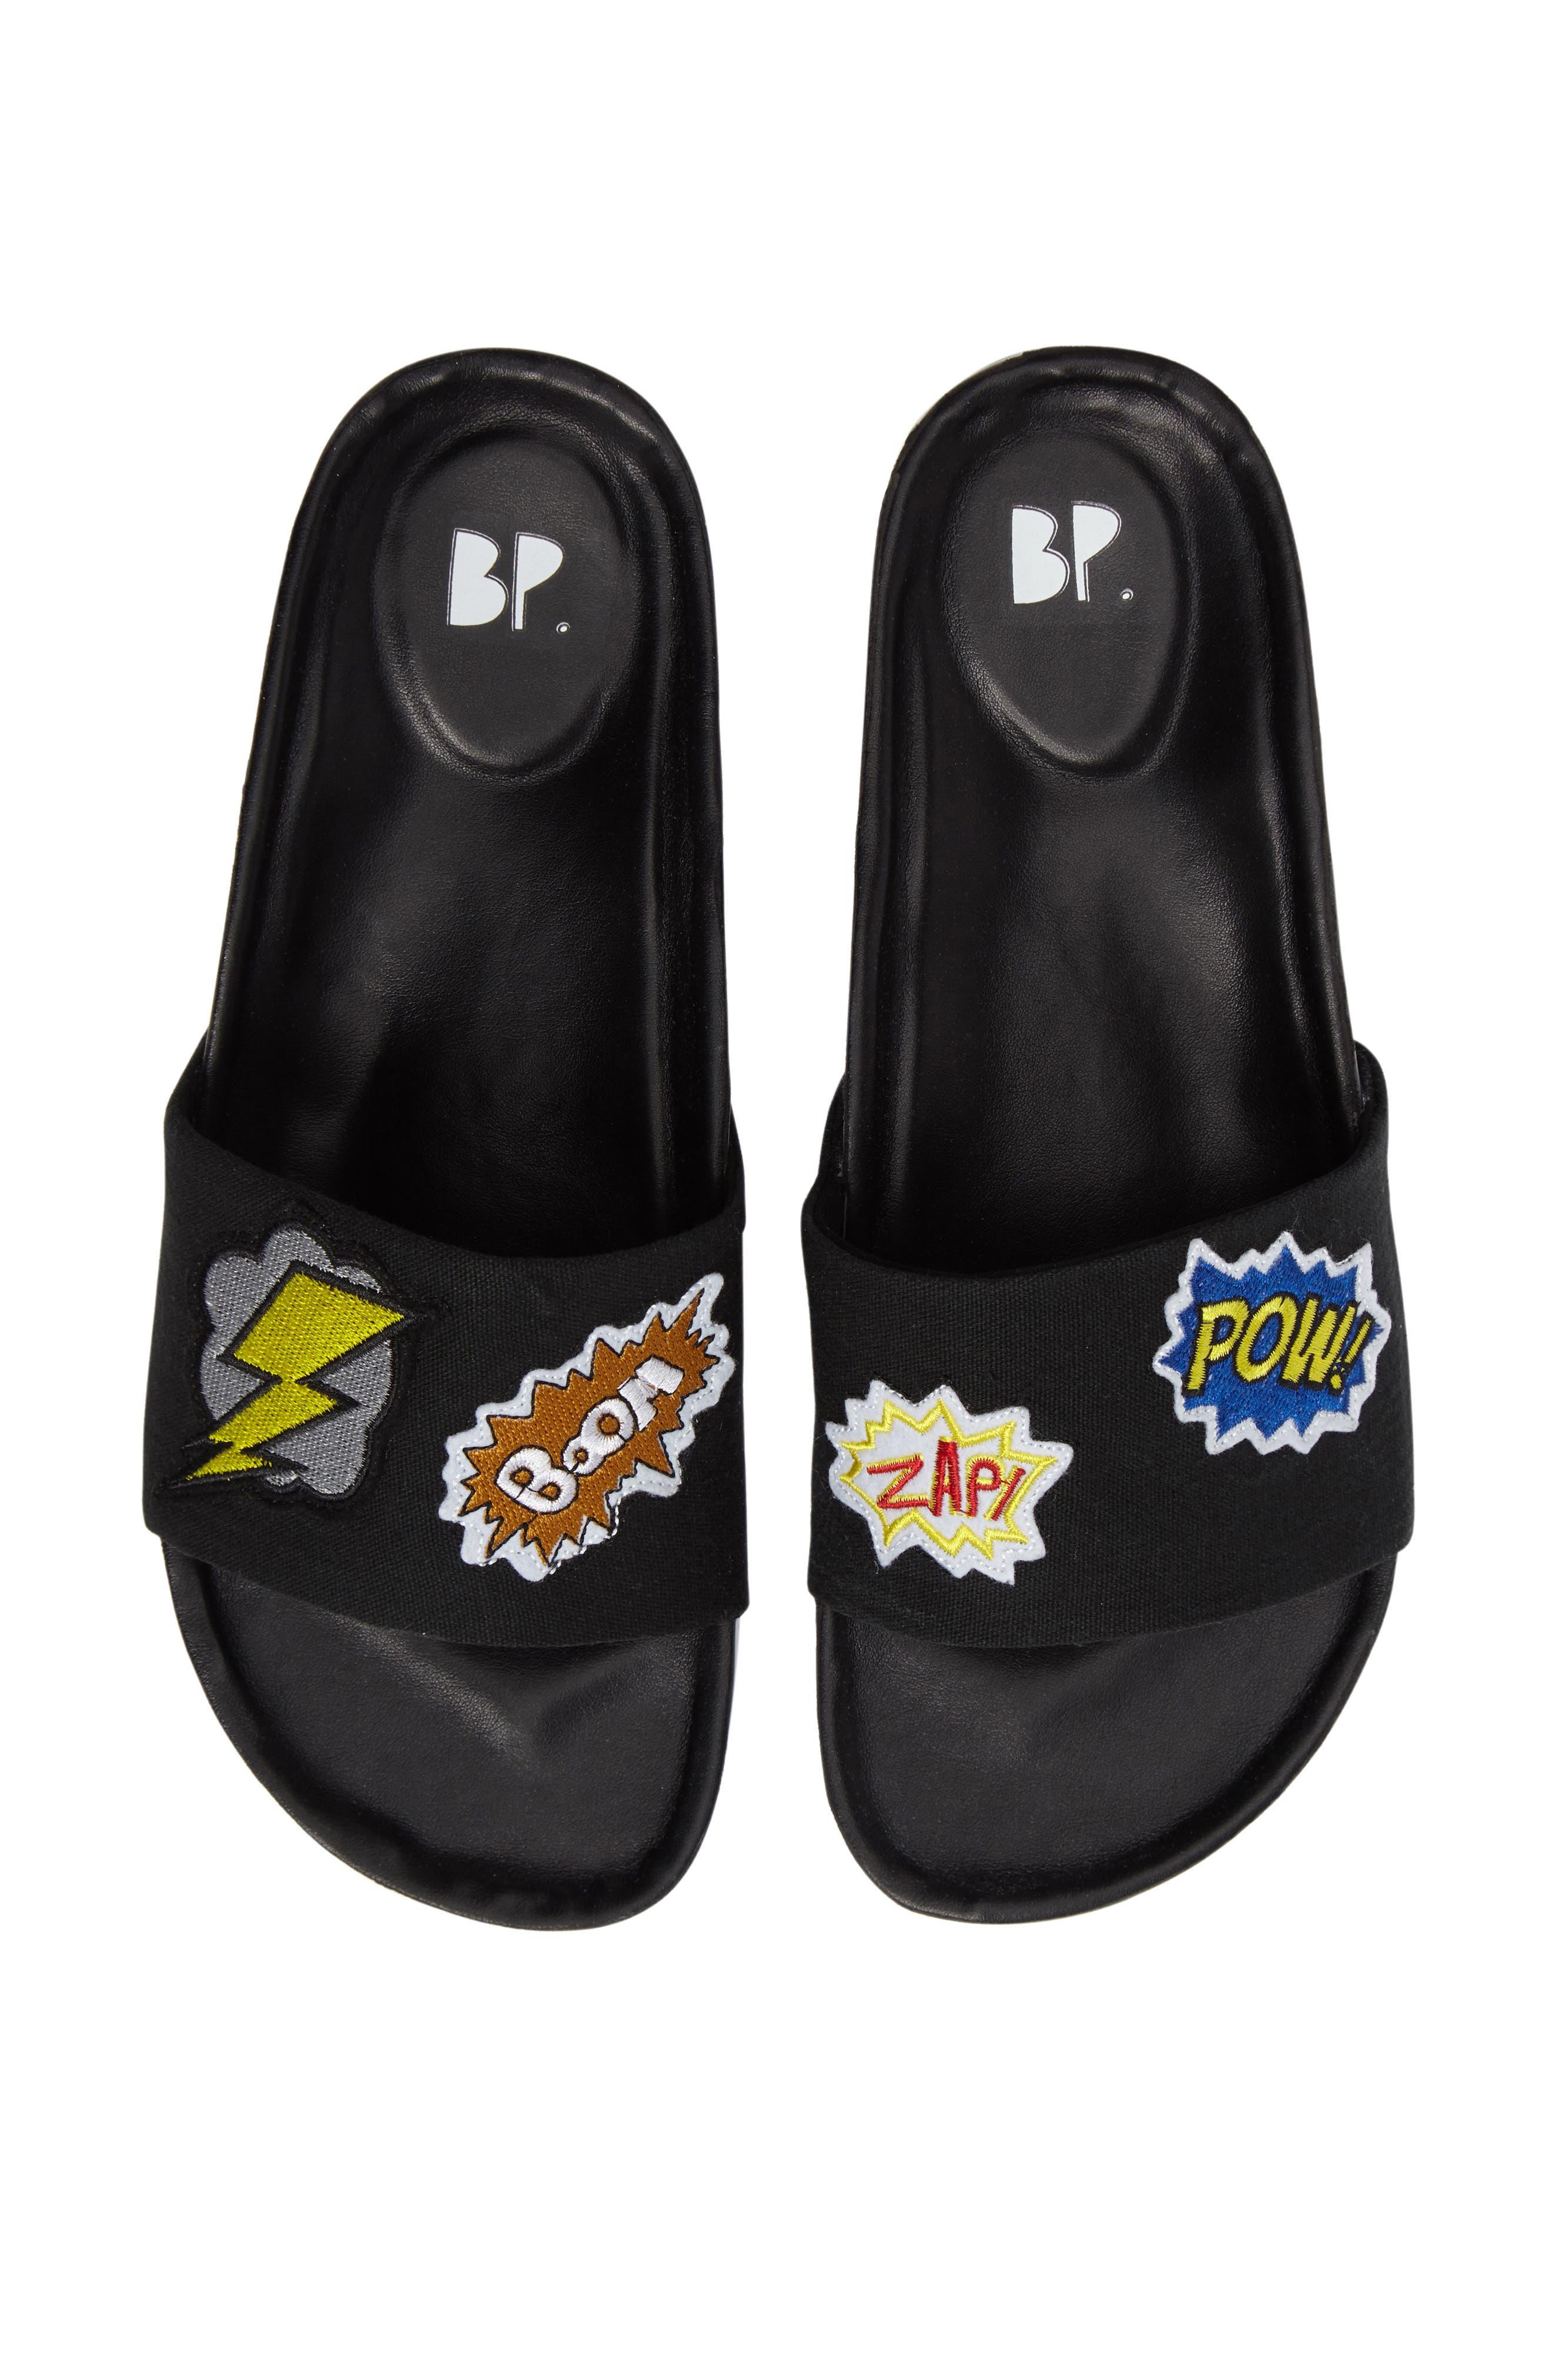 Slide Sandal,                             Main thumbnail 1, color,                             001